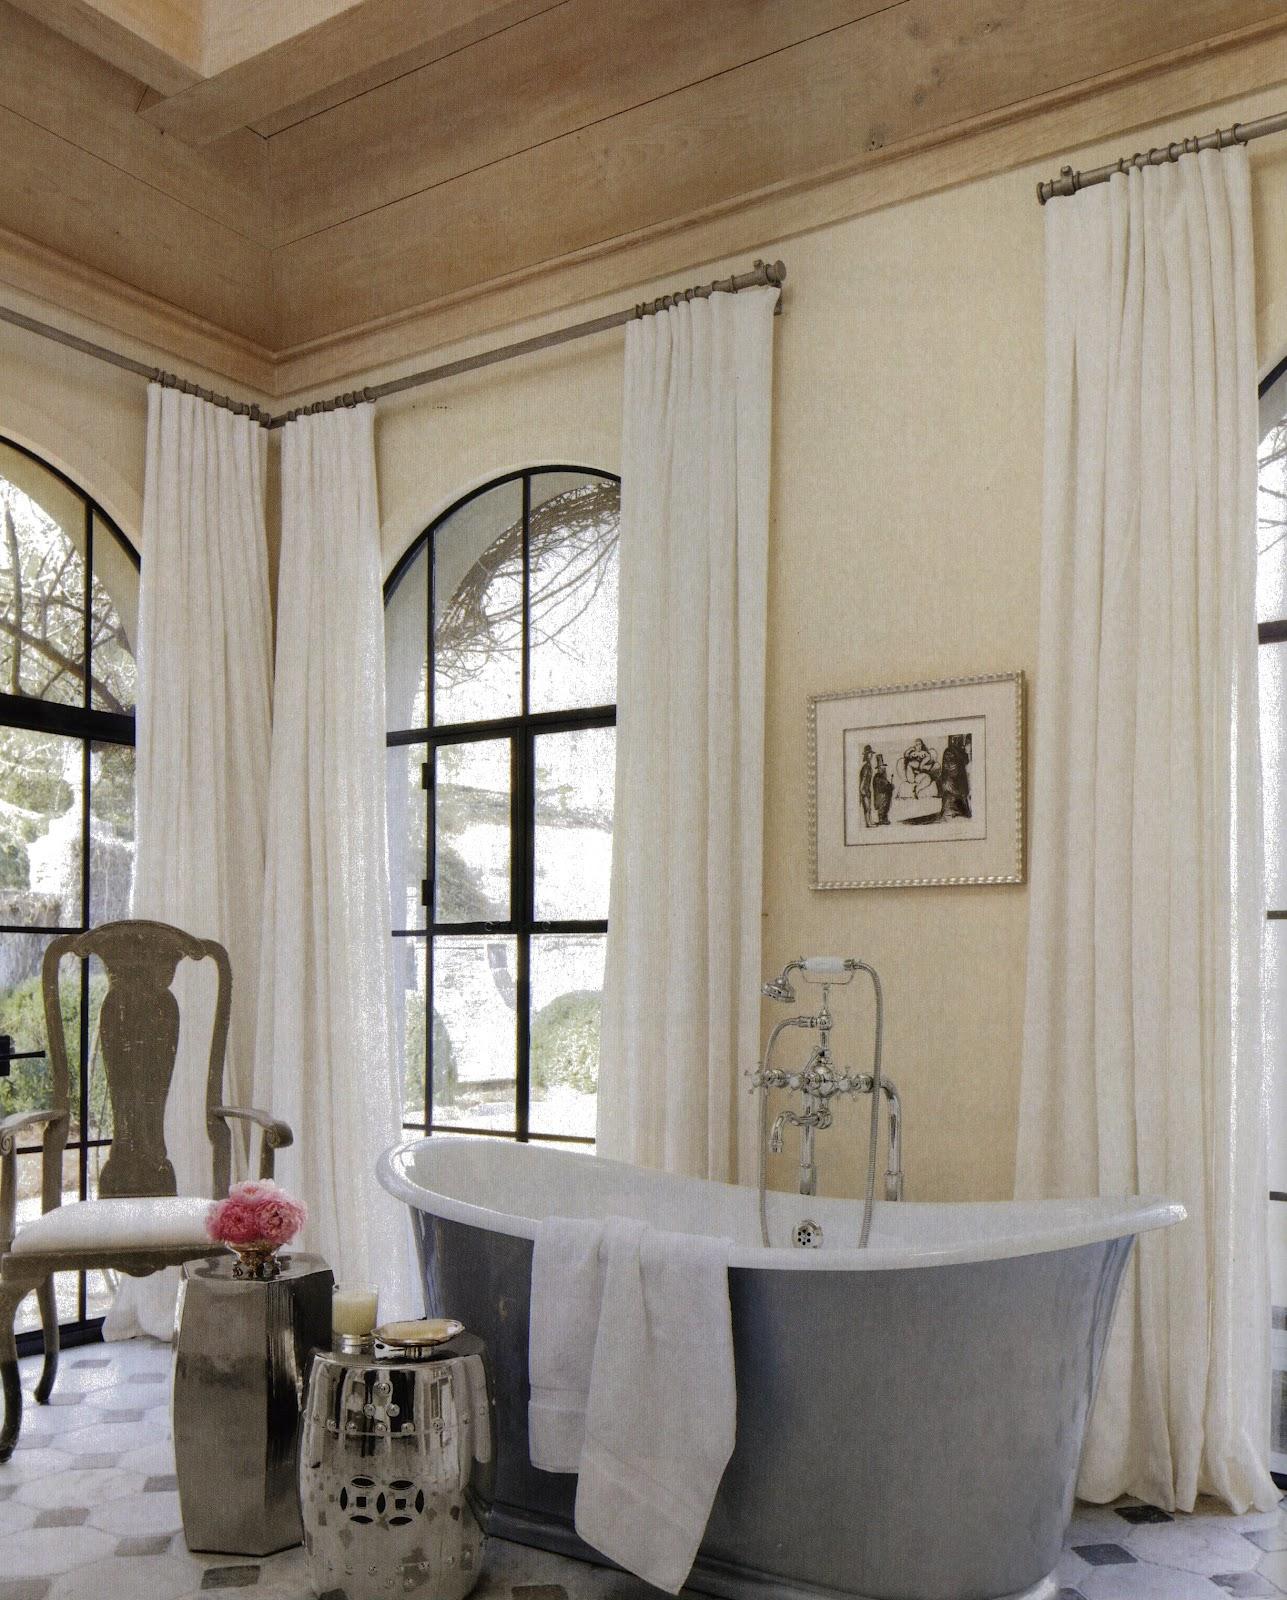 House Beautiful Bathrooms 2015: Perry Koko Loves: HOUSEBEAUTIFUL